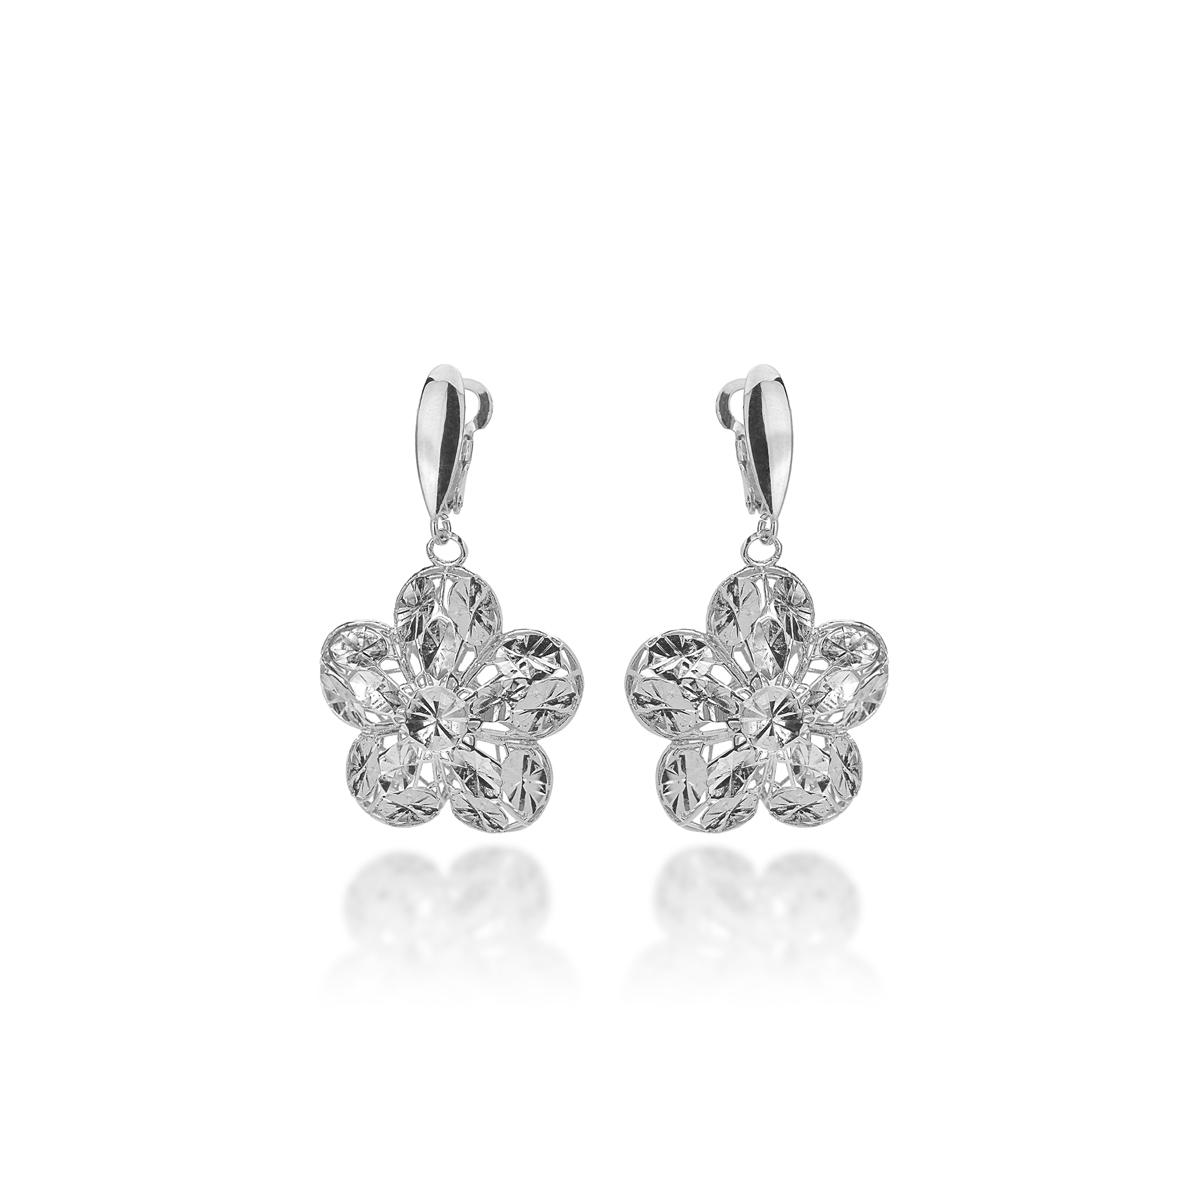 Silver Earrings With Diamonds Effect